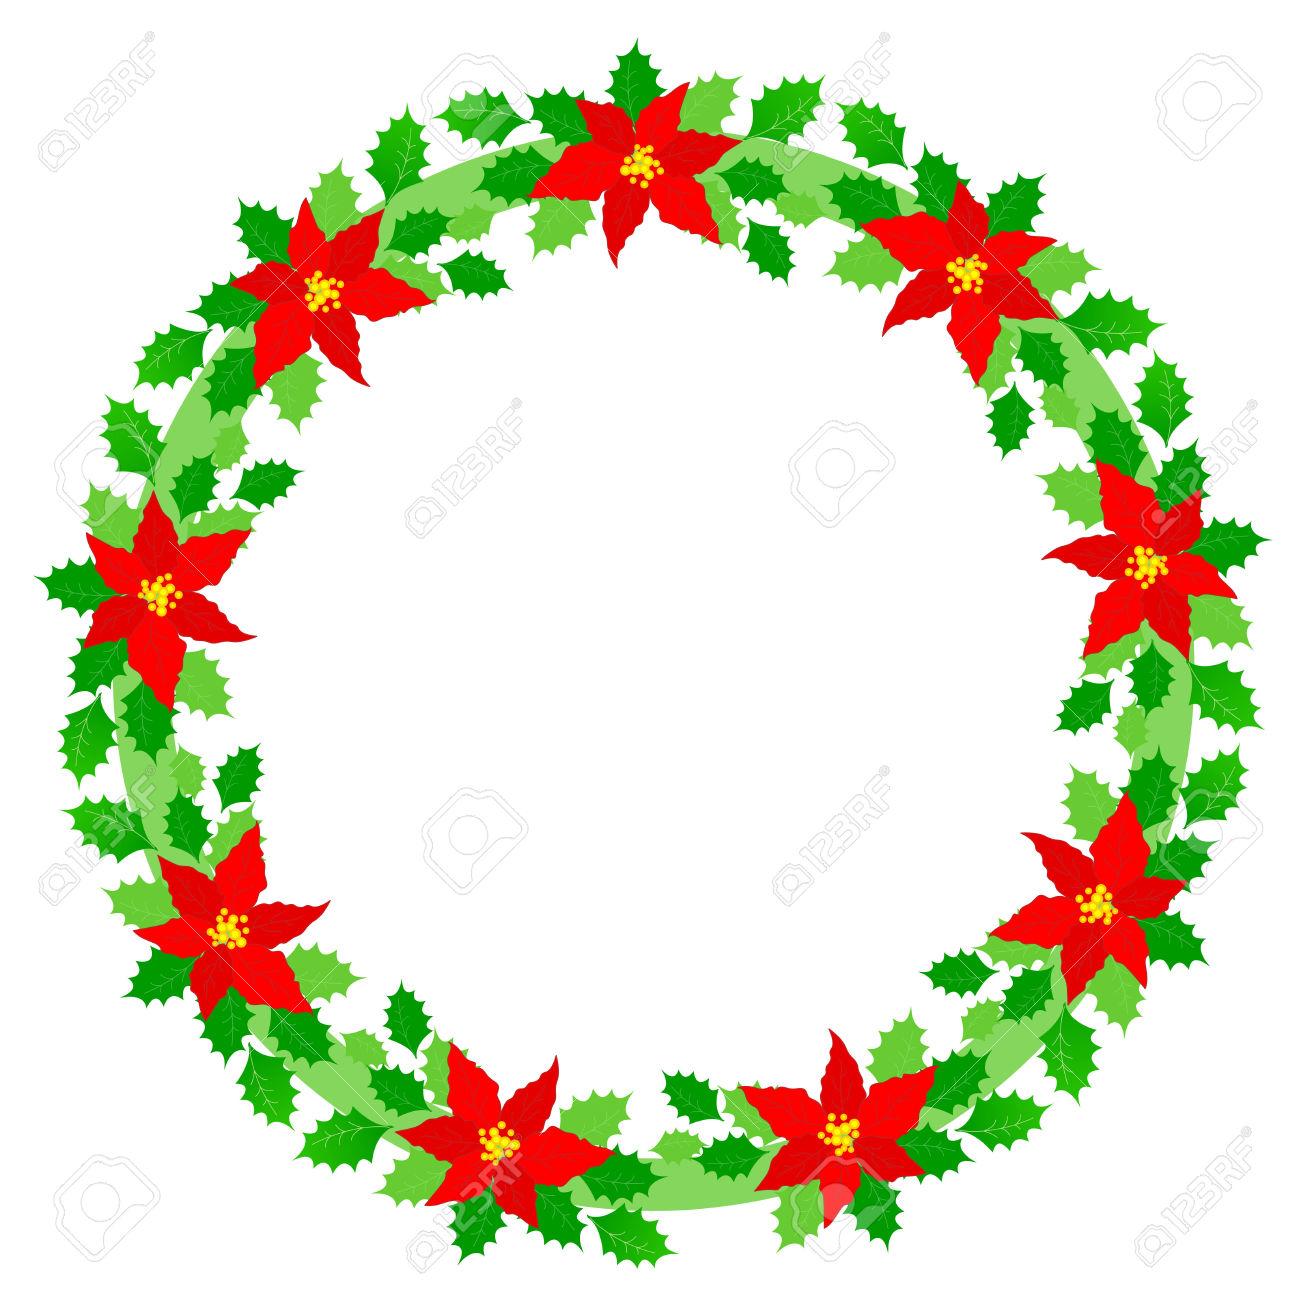 1299x1300 Poinsettia Clipart Beautiful Christmas